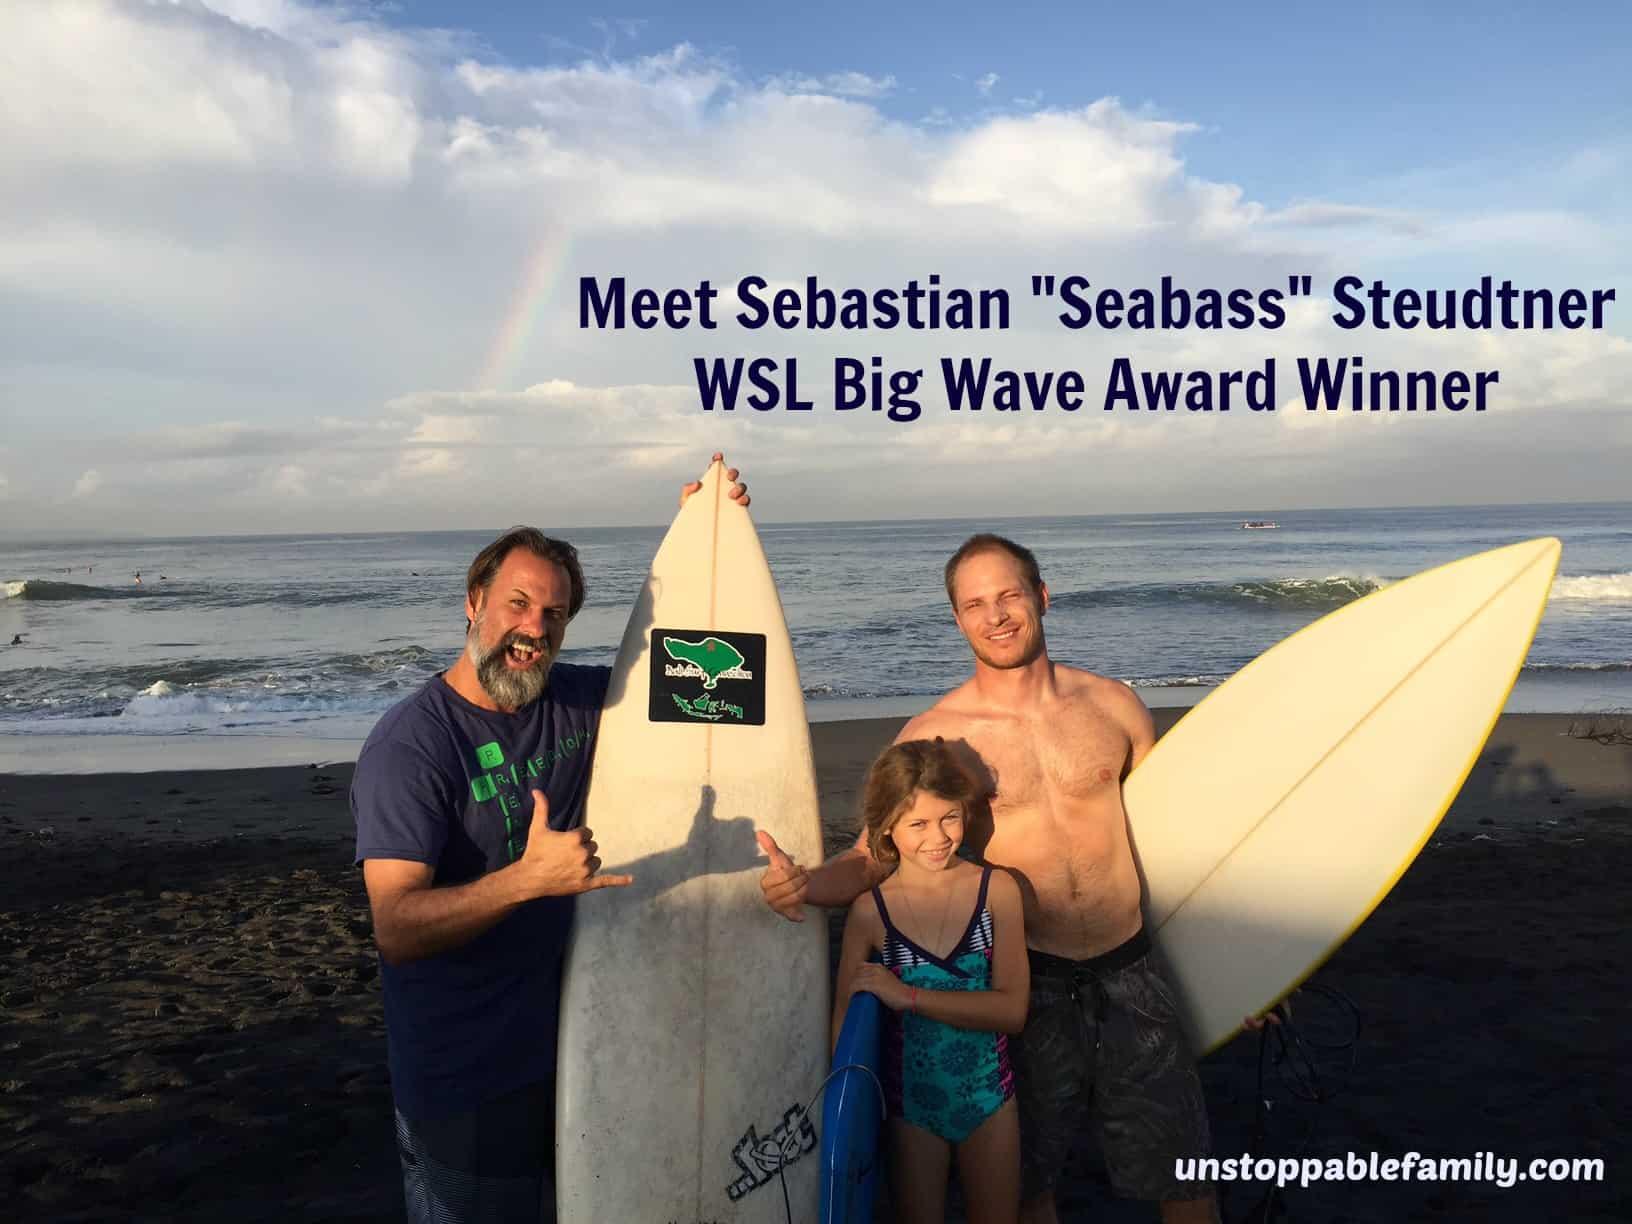 WSL Big Wave Award Winner